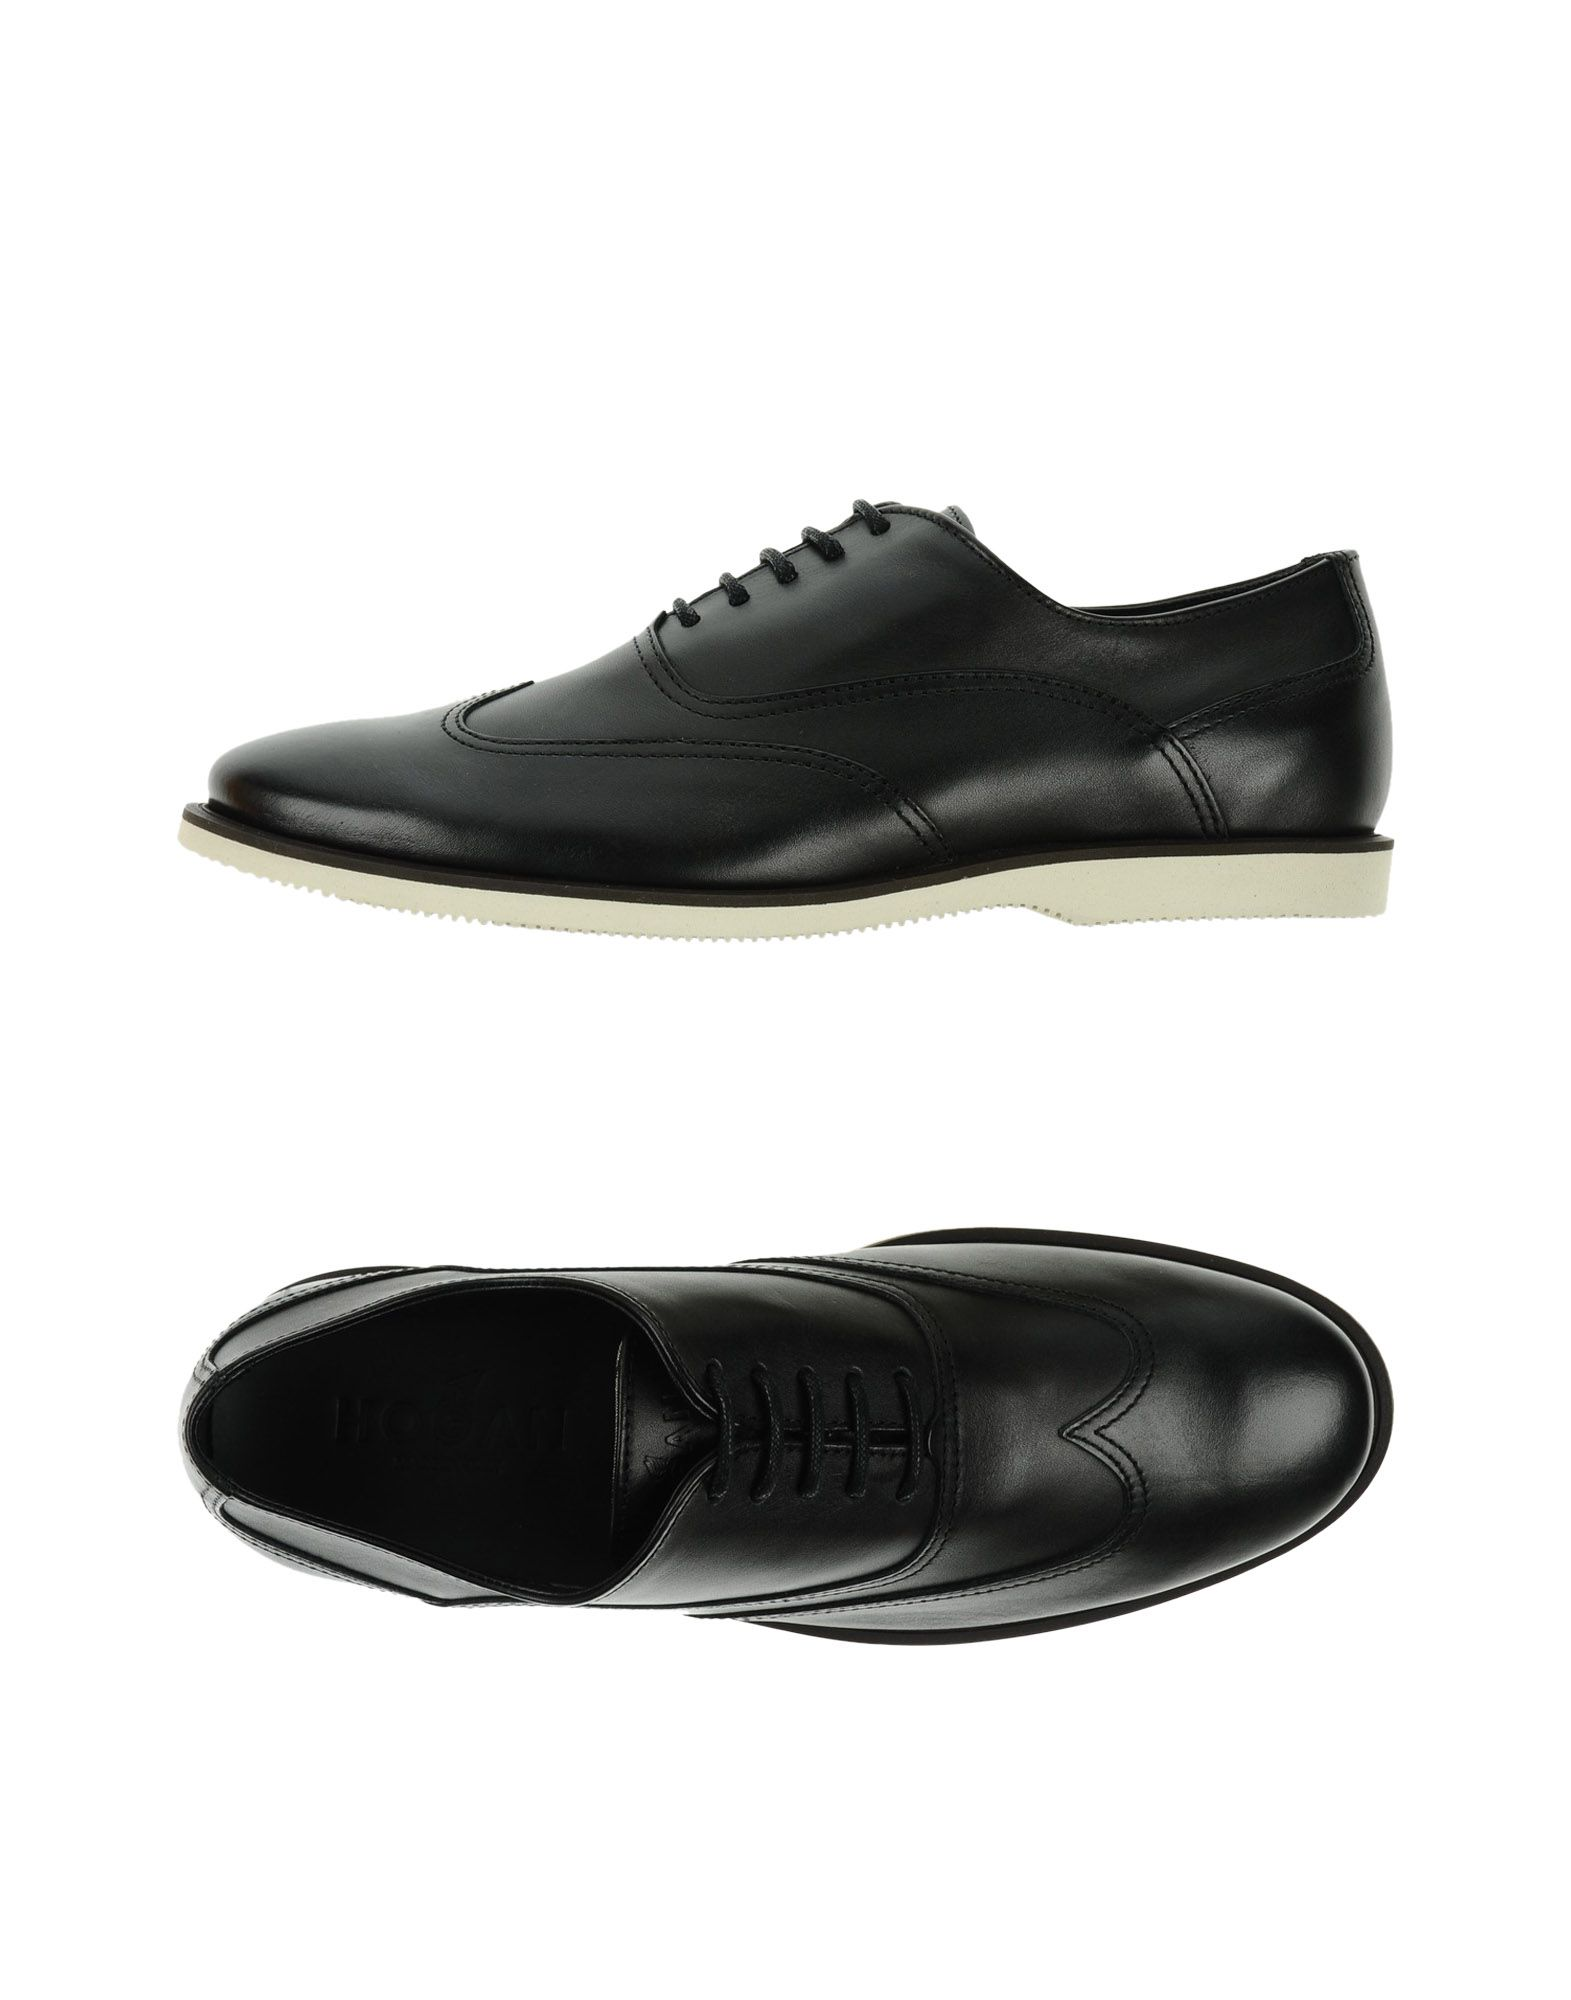 Hogan Sneakers Herren  11336509UM Gute Qualität beliebte Schuhe